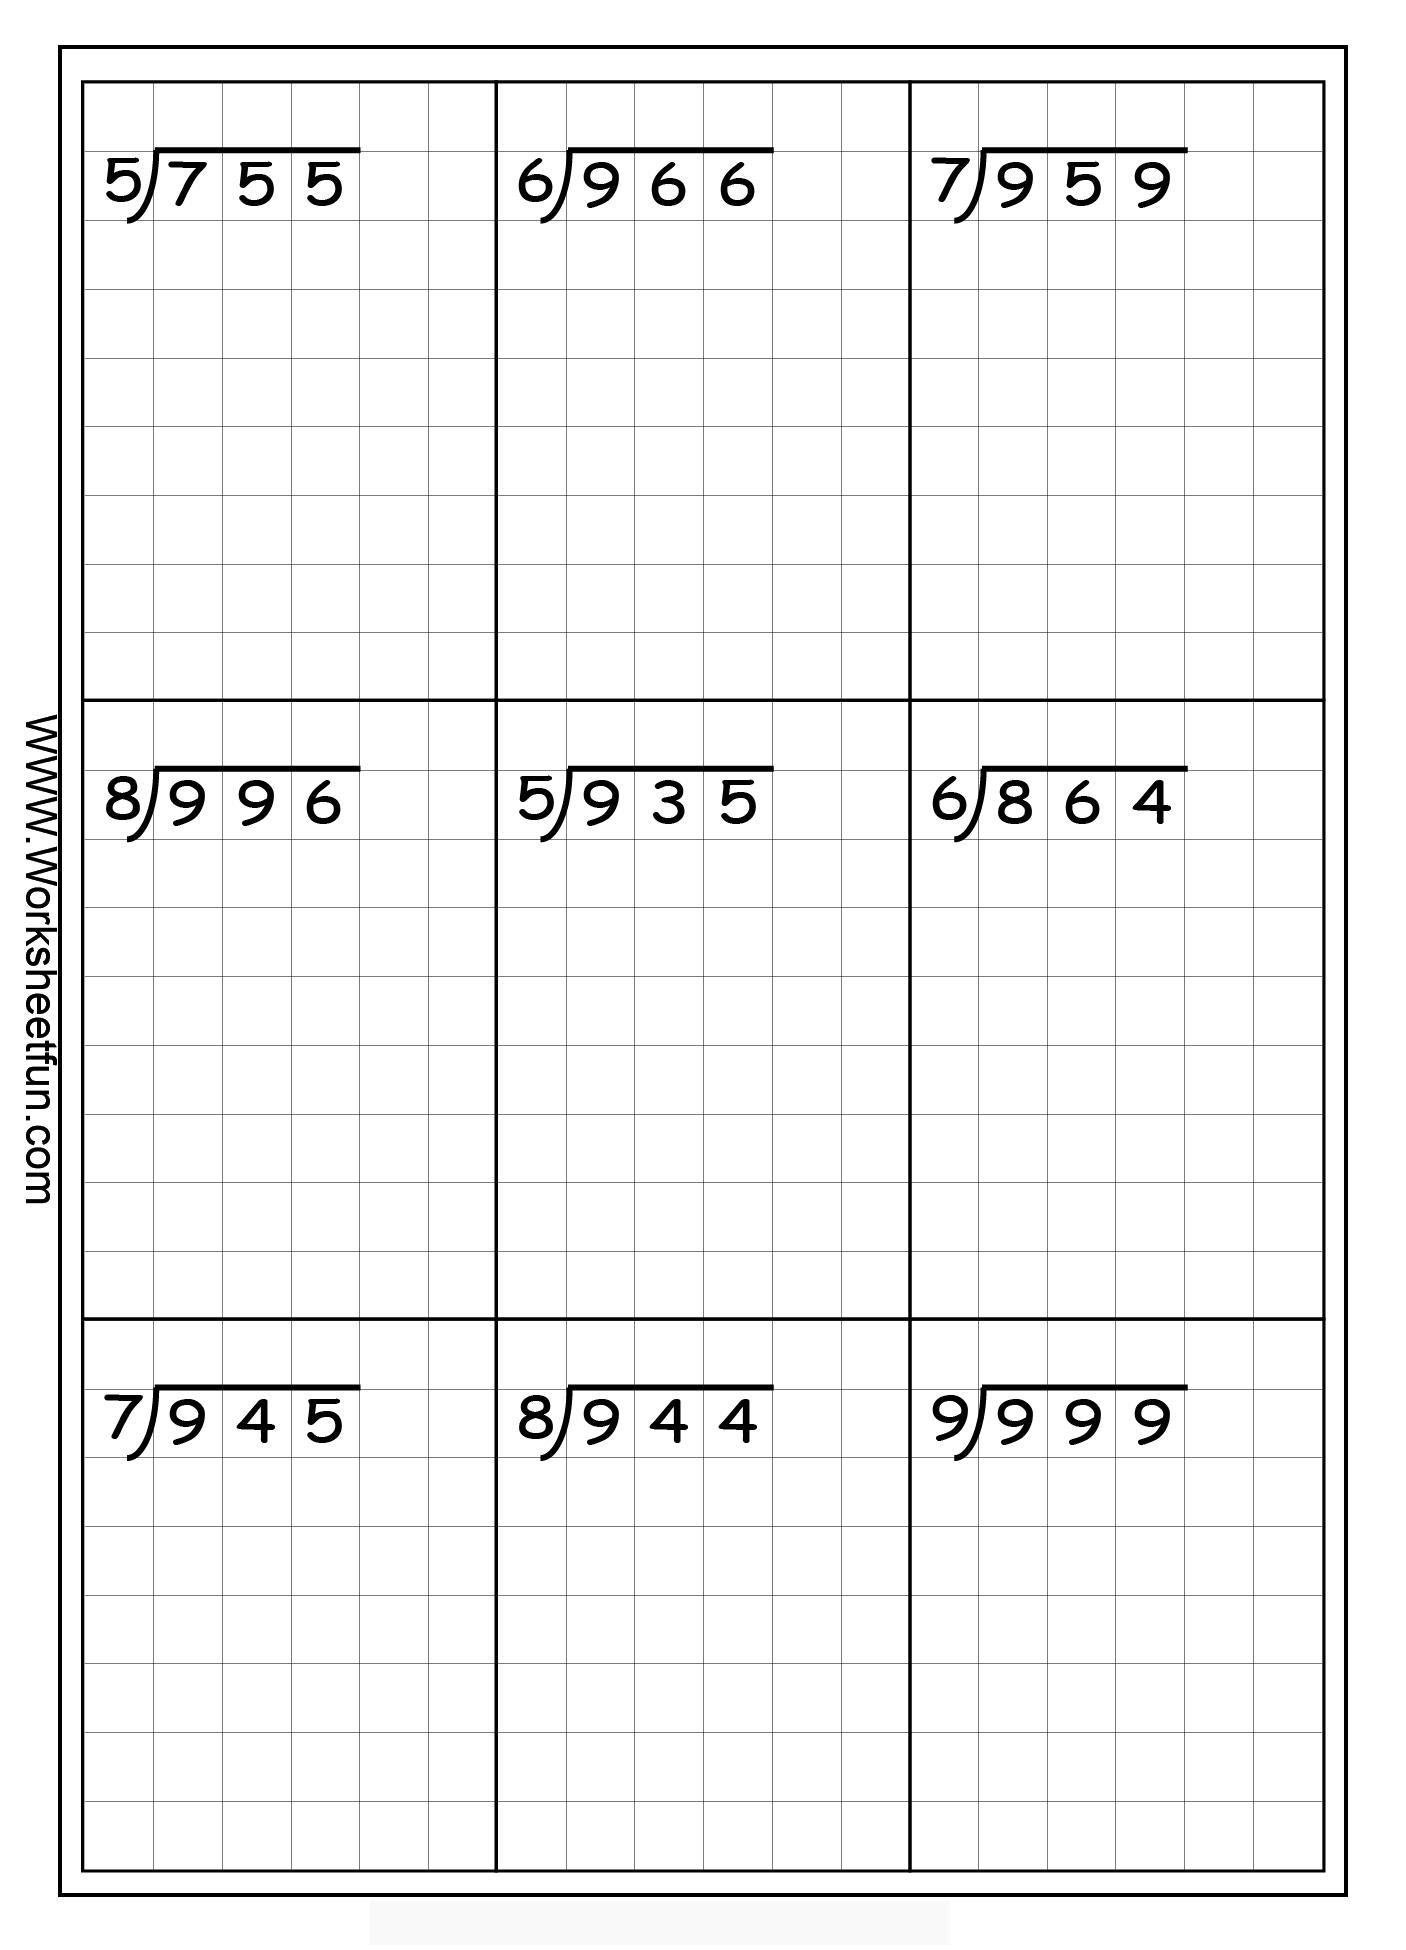 Long Division Free Worksheets | Eva School | Math Division, Long - Free Printable Division Worksheets For 5Th Grade